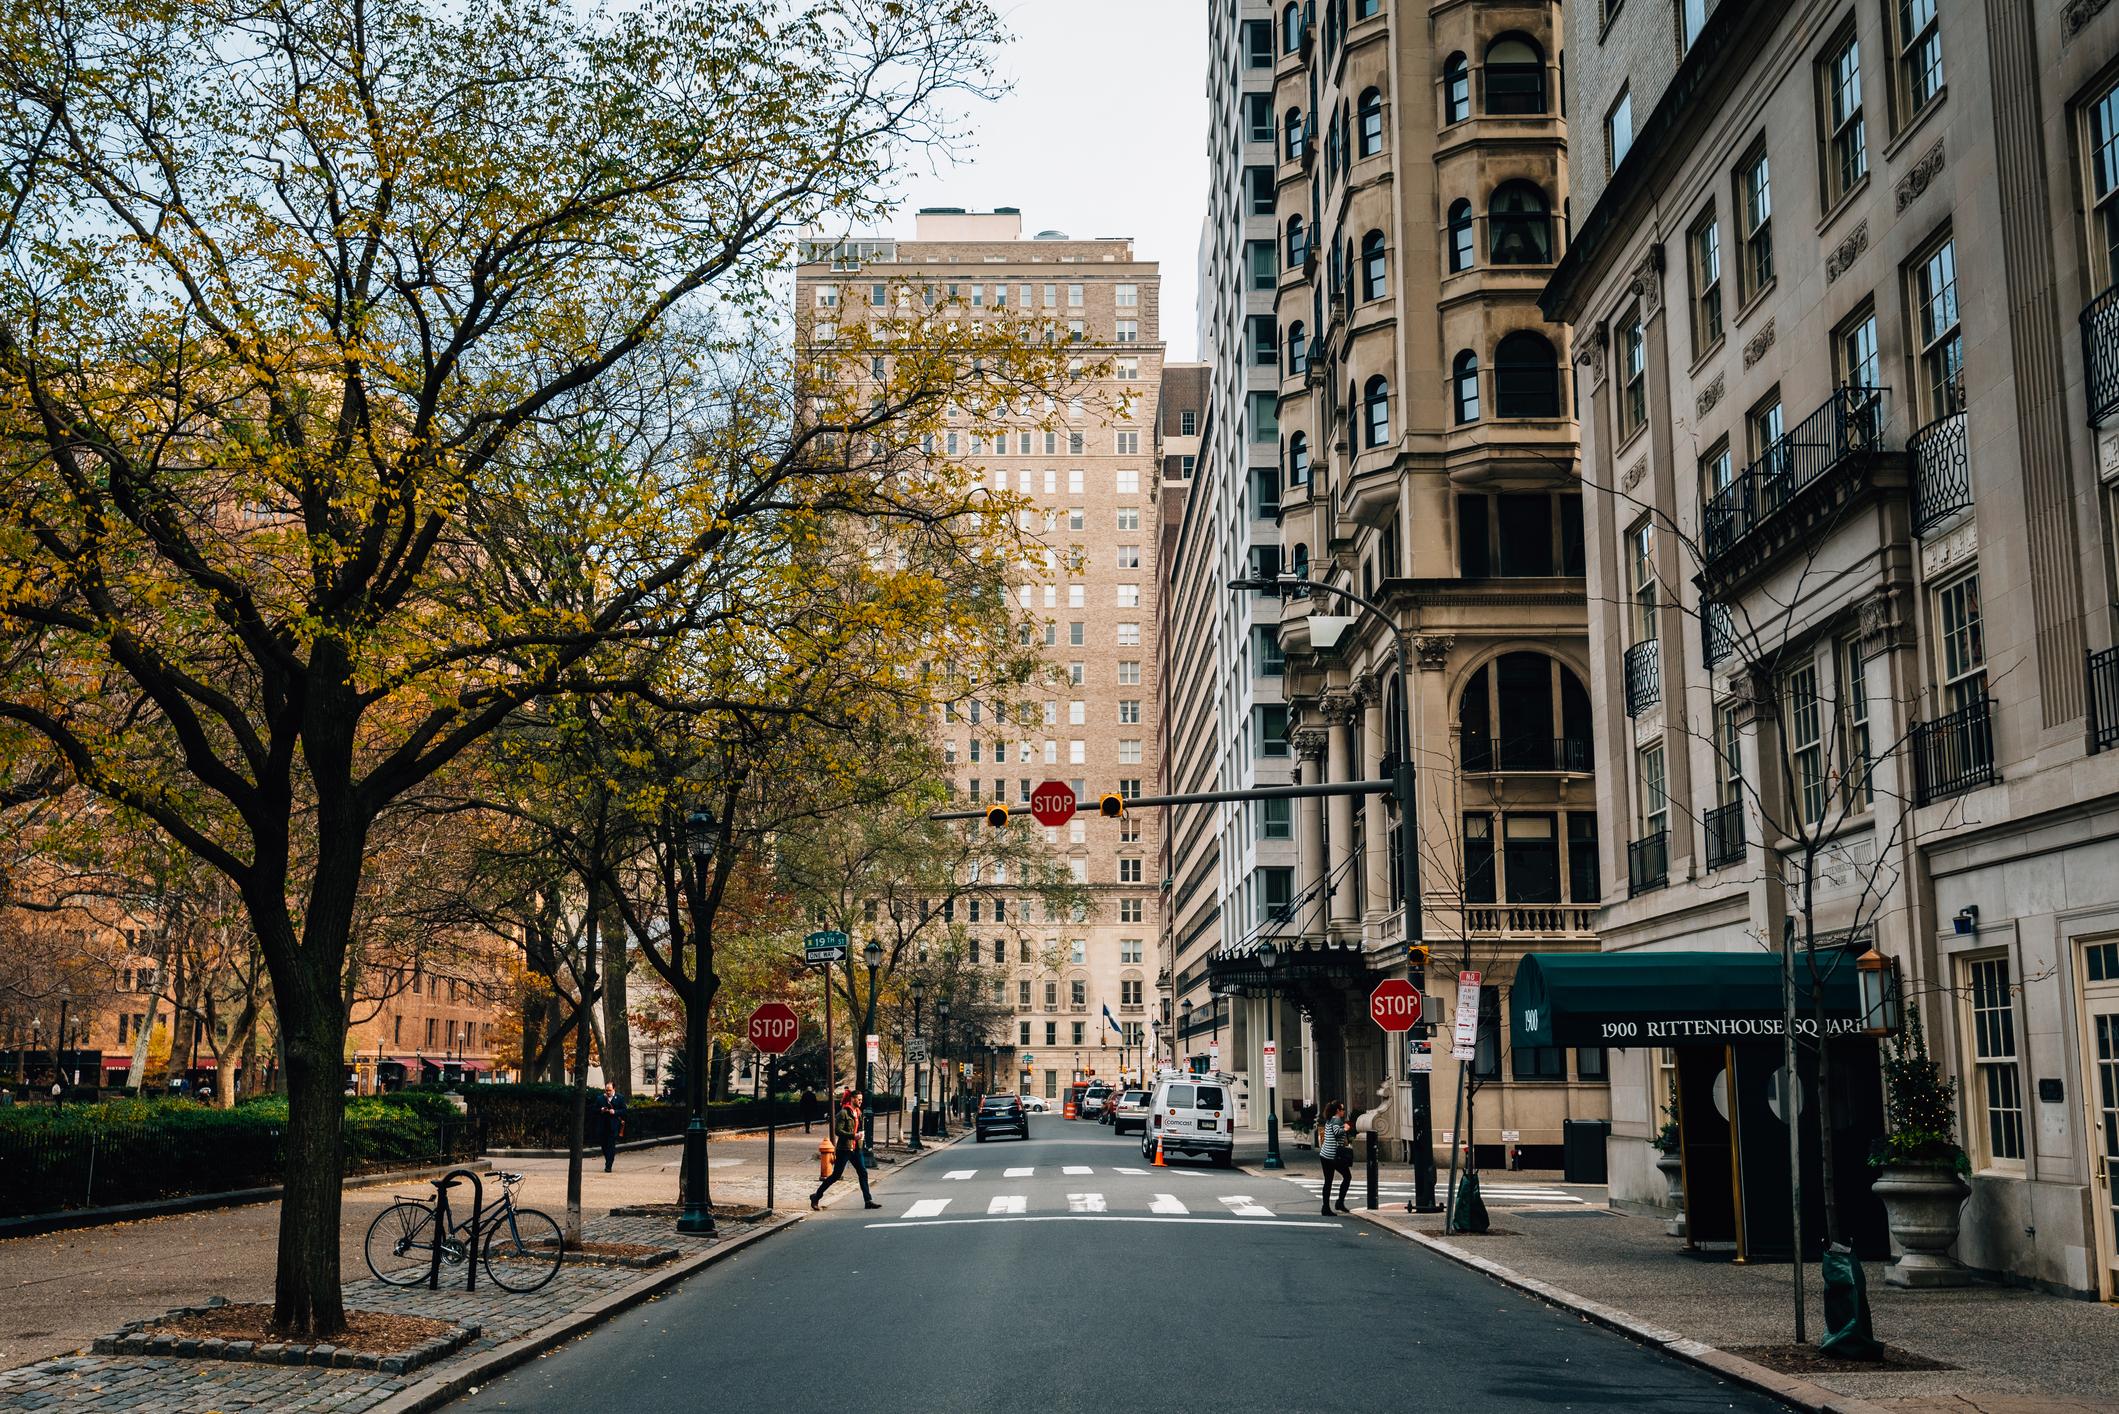 Rittenhouse Square, in Philadelphia